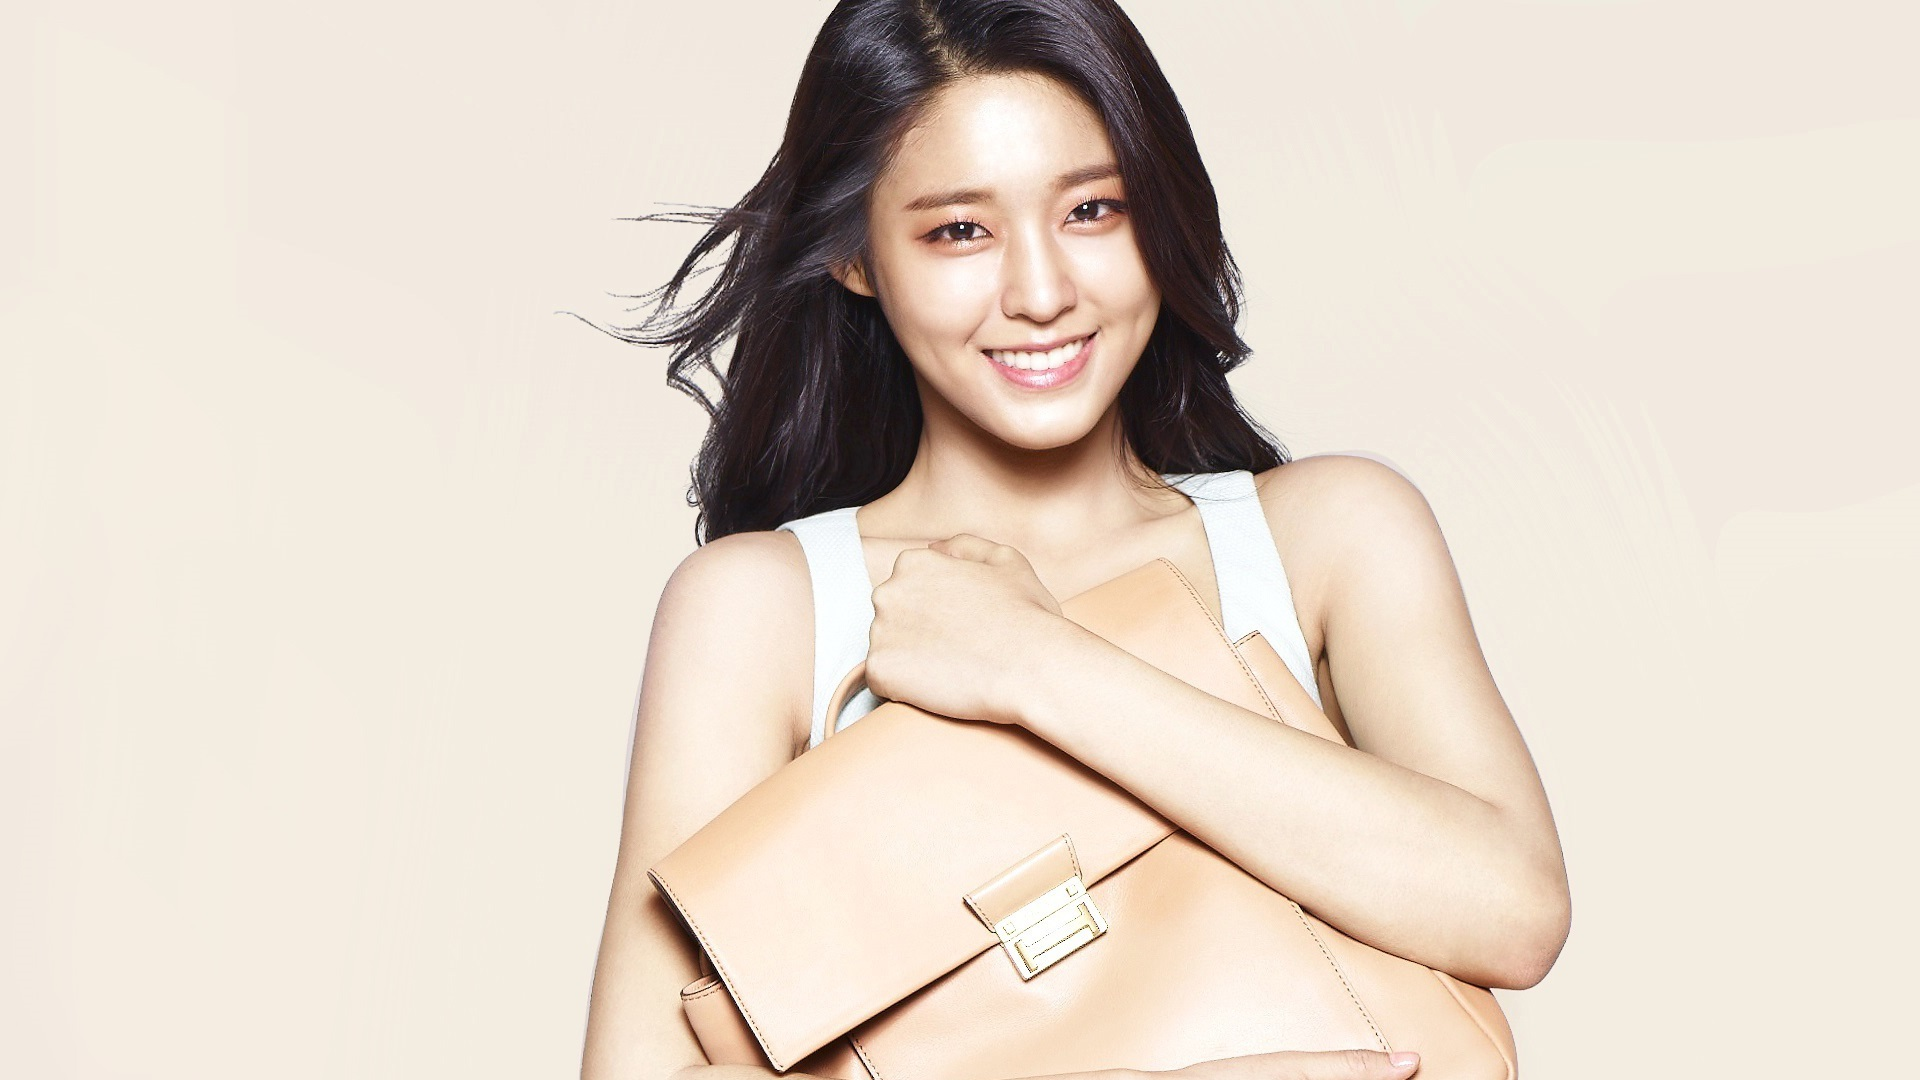 Wallpaper korean girls seolhyun 02 hd picture image wallpaper korean girls seolhyun 02 voltagebd Gallery